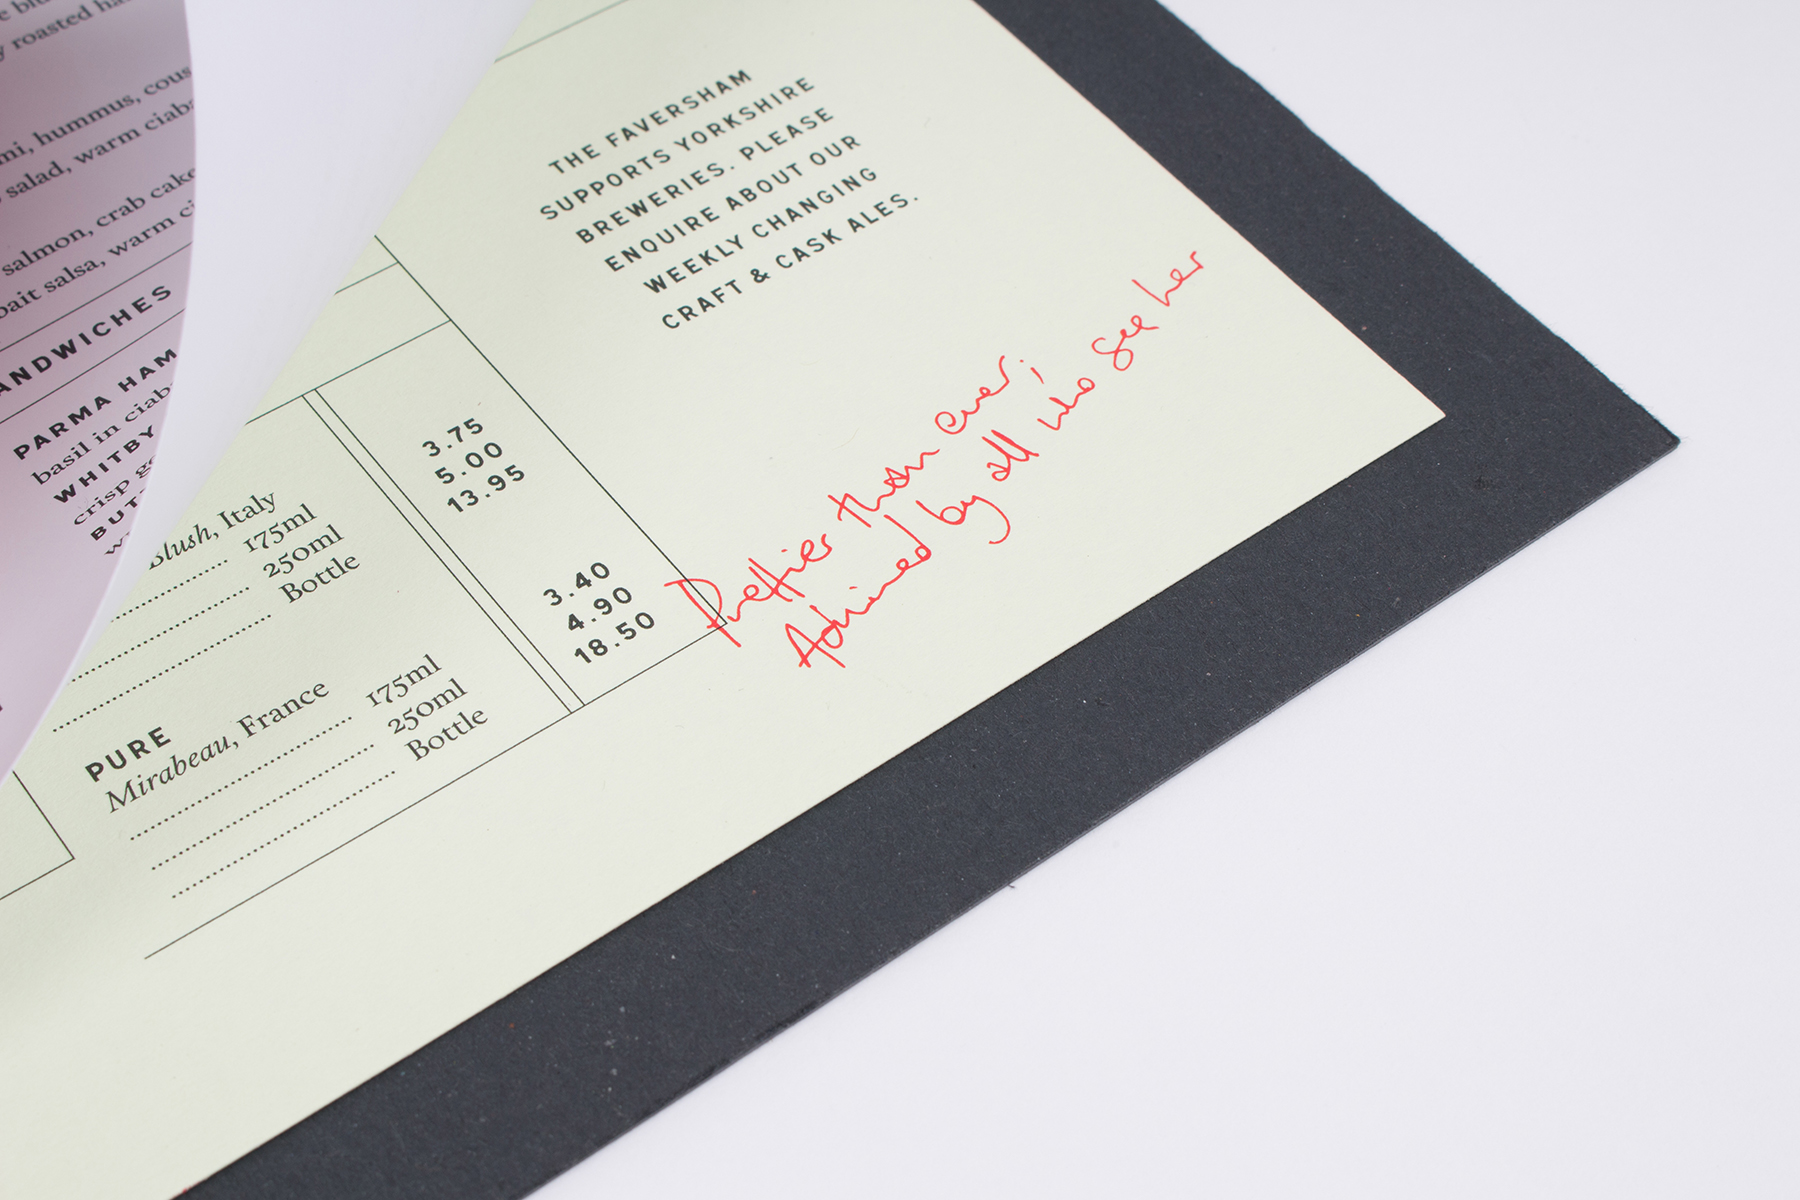 The Faversham Rebranding by Passport Design Bureau